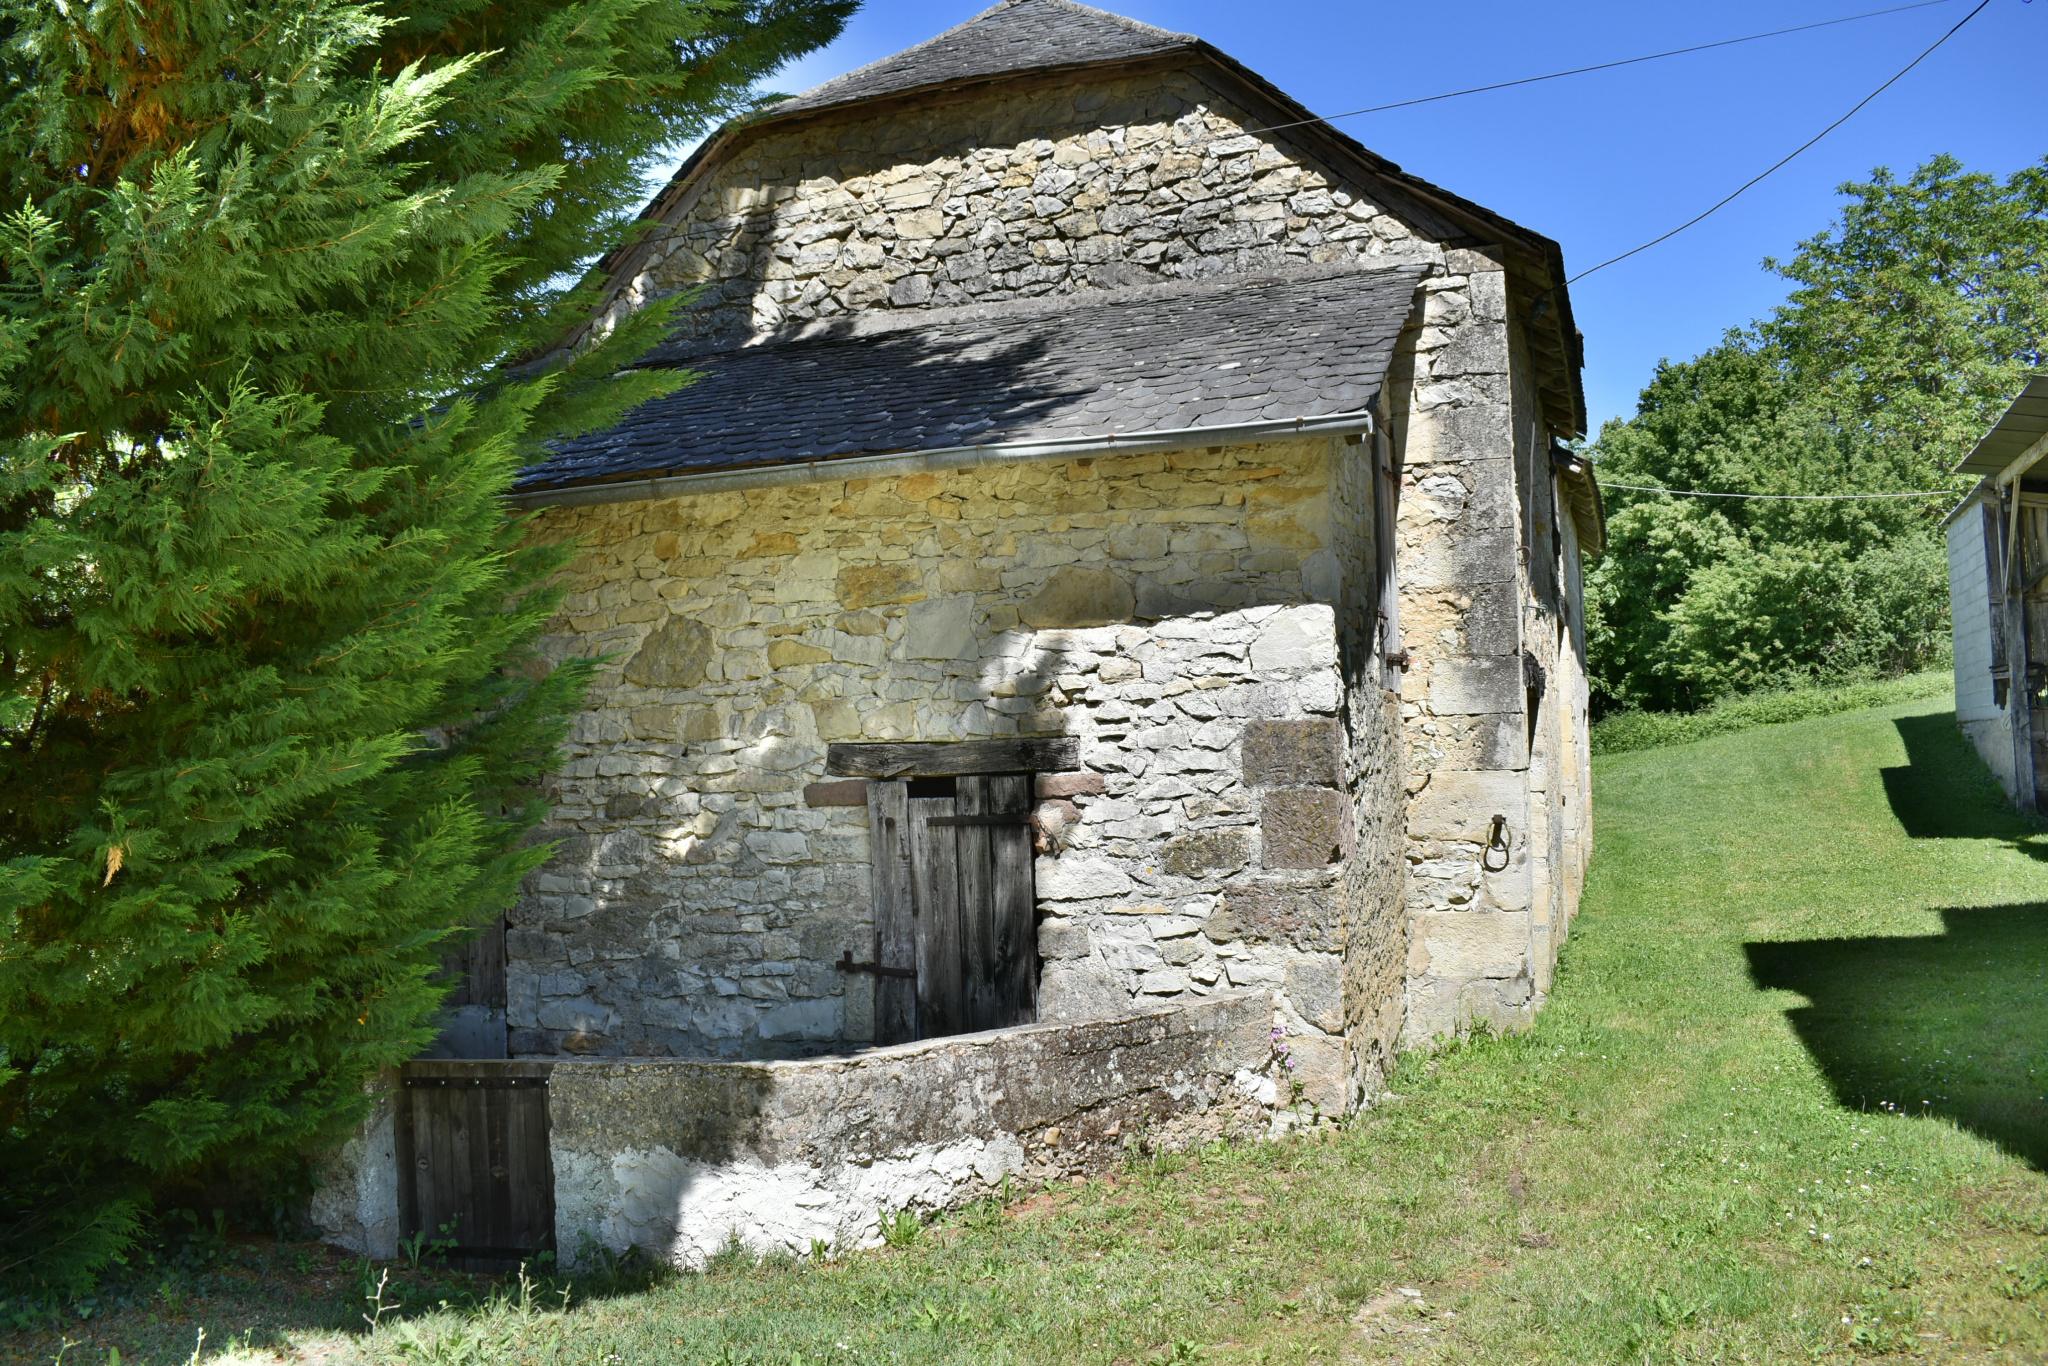 Terrasson Propriete Maison Grange Noyeraie